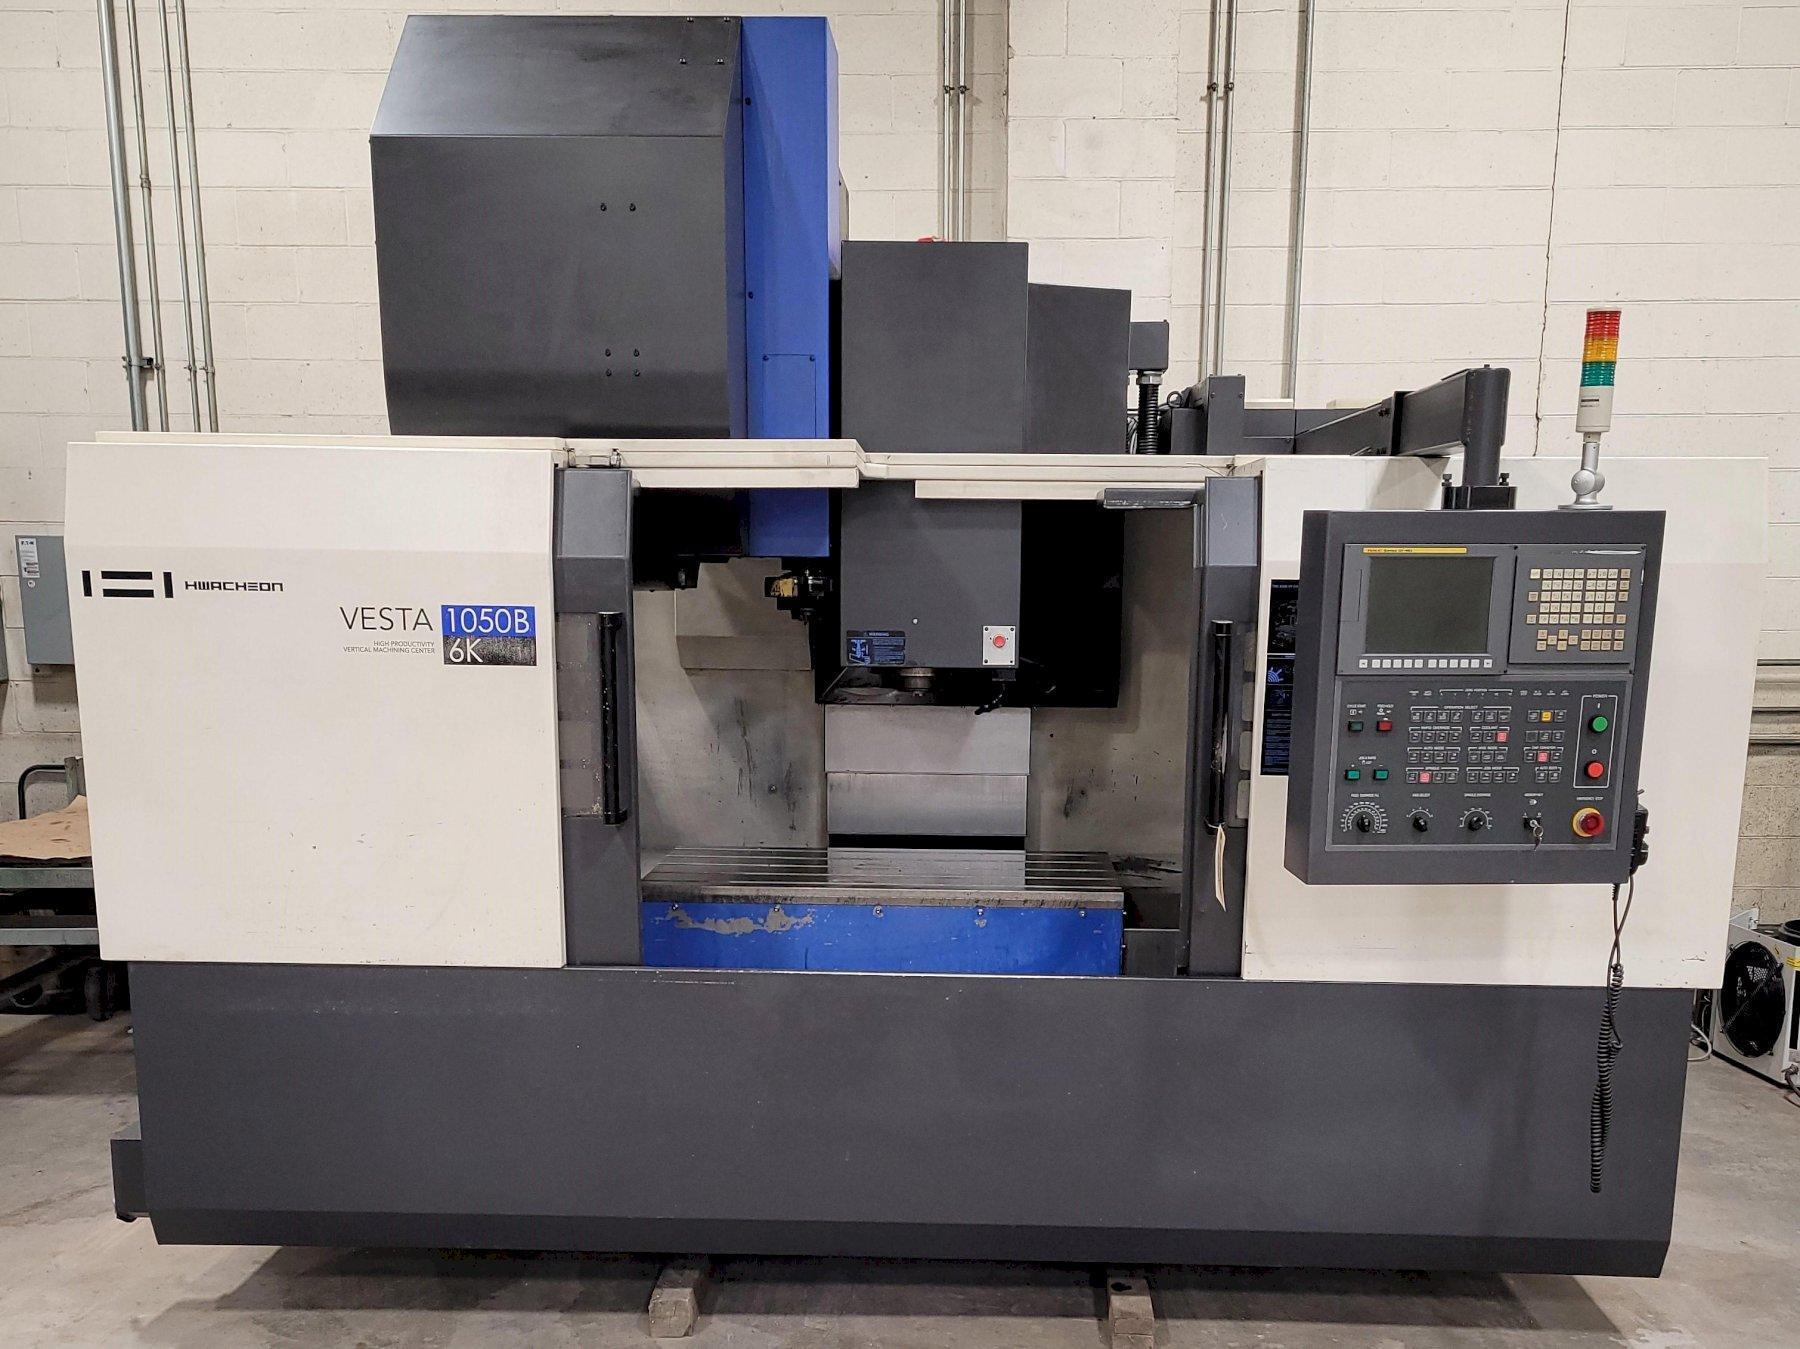 "Hwacheon Model Vesta 1050B Vertical Machining Center 25.5"" x 45"" Table. FANUC OiMD CNC 50 Taper. 24ATC. TSC. Well Equipped 2011"